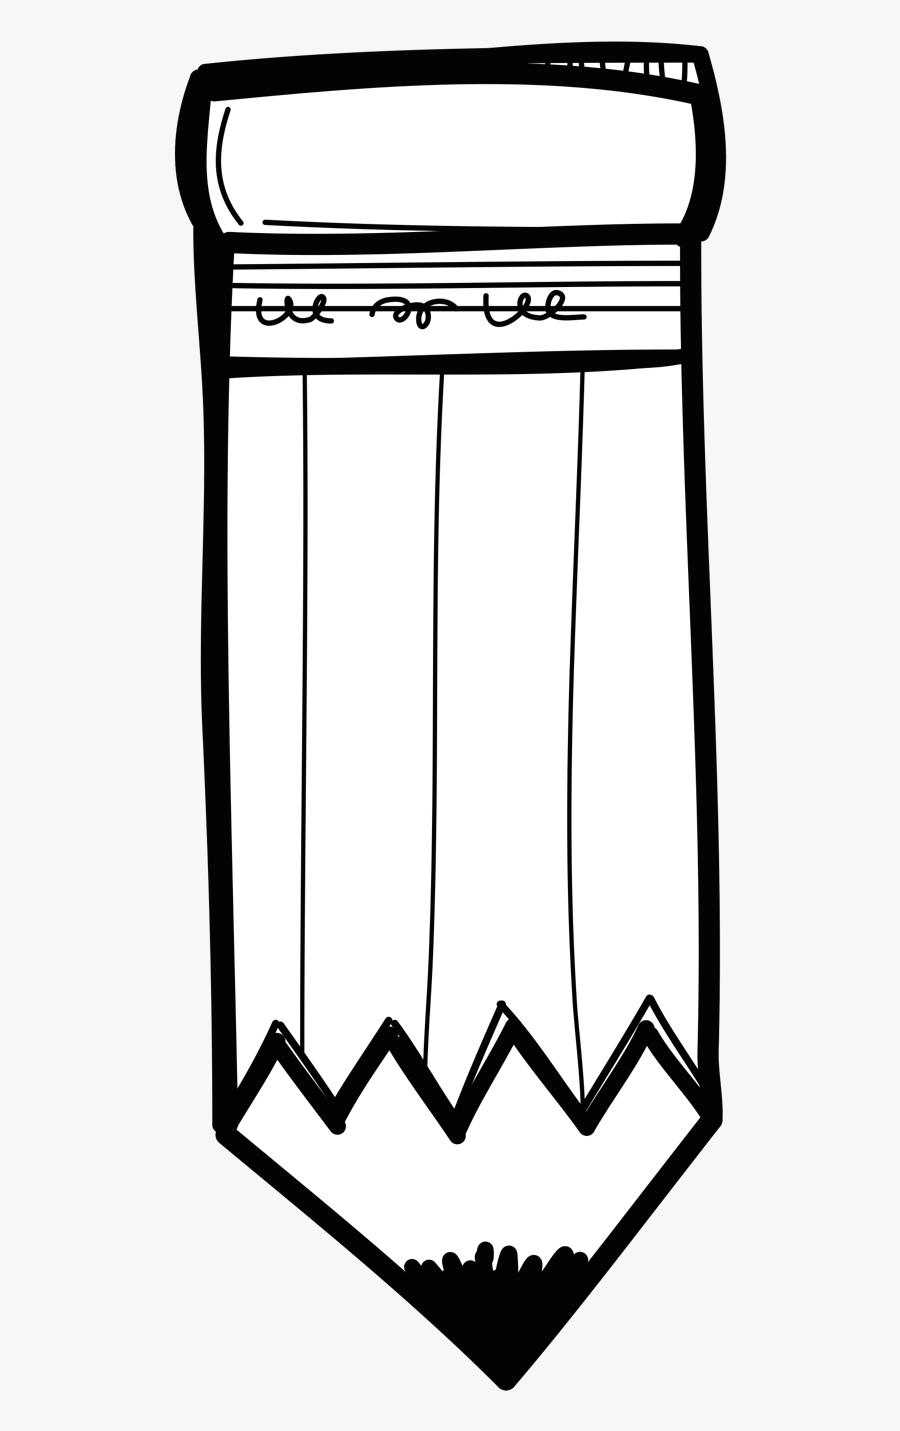 Pencil Clipart, School Clipart, School Supplies, Classroom - School Supply Clipart Black And White, Transparent Clipart